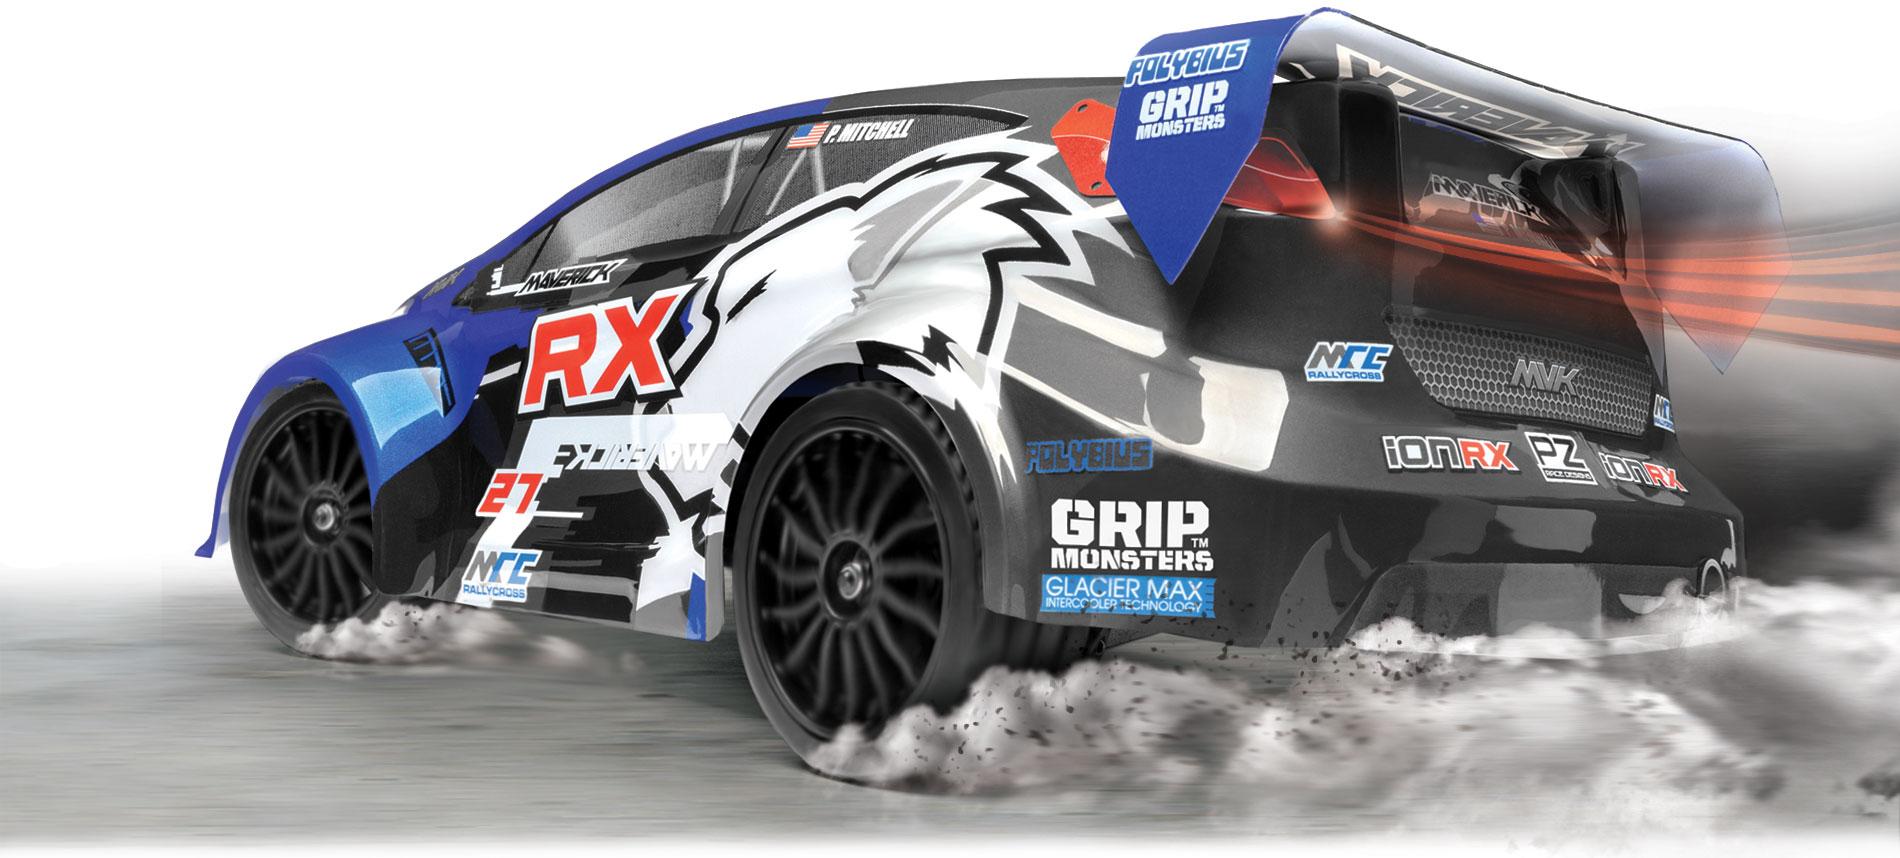 Automodel Maverick ION RX Rally